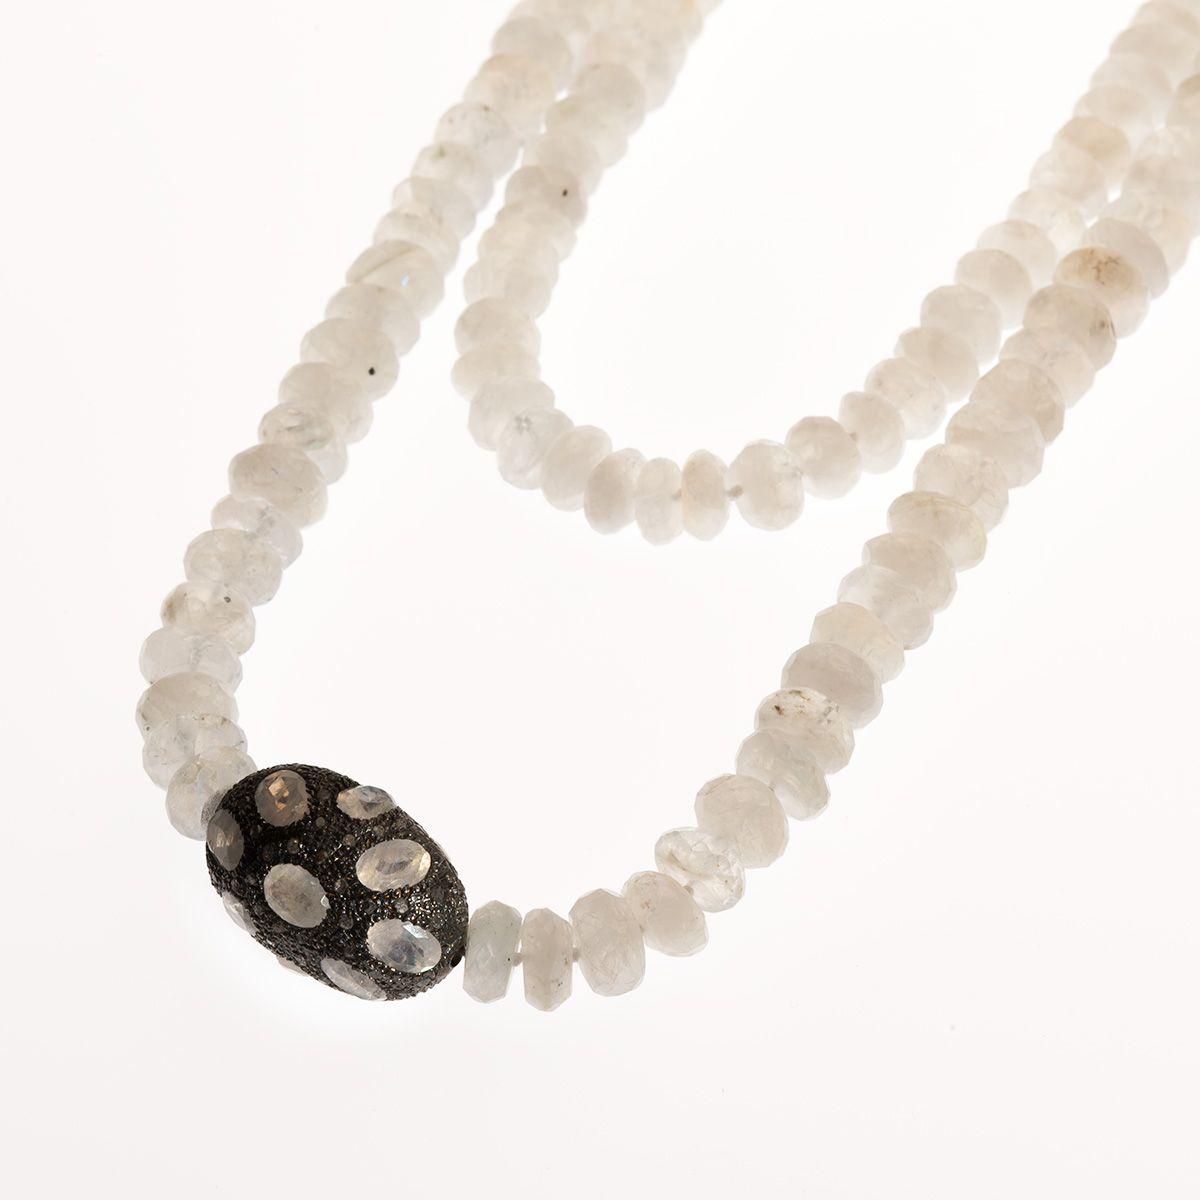 Siena Jewelry in JR Showroom Now www.jackryanjewelry.com sales@jackryanjewelry.com #JackRyan - Jack Ryan